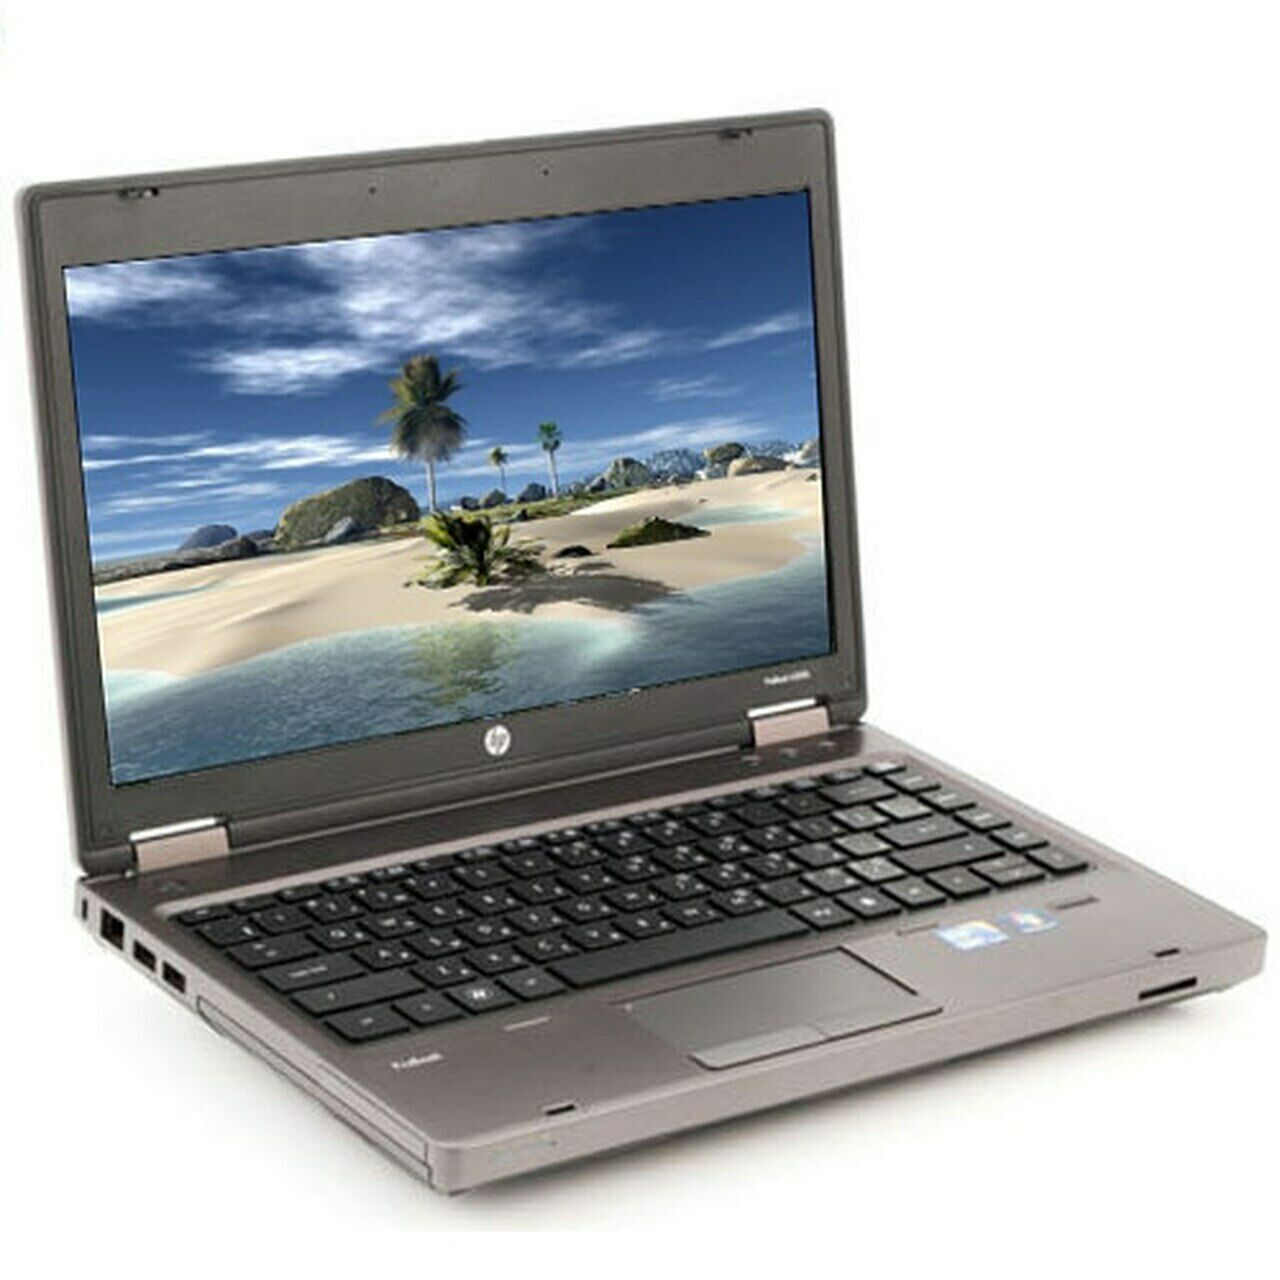 "Laptop Windows - HP Laptop PC Windows 10 Intel C2D 4GB 250GB 13.3"" Computer WIFI School Notebook"